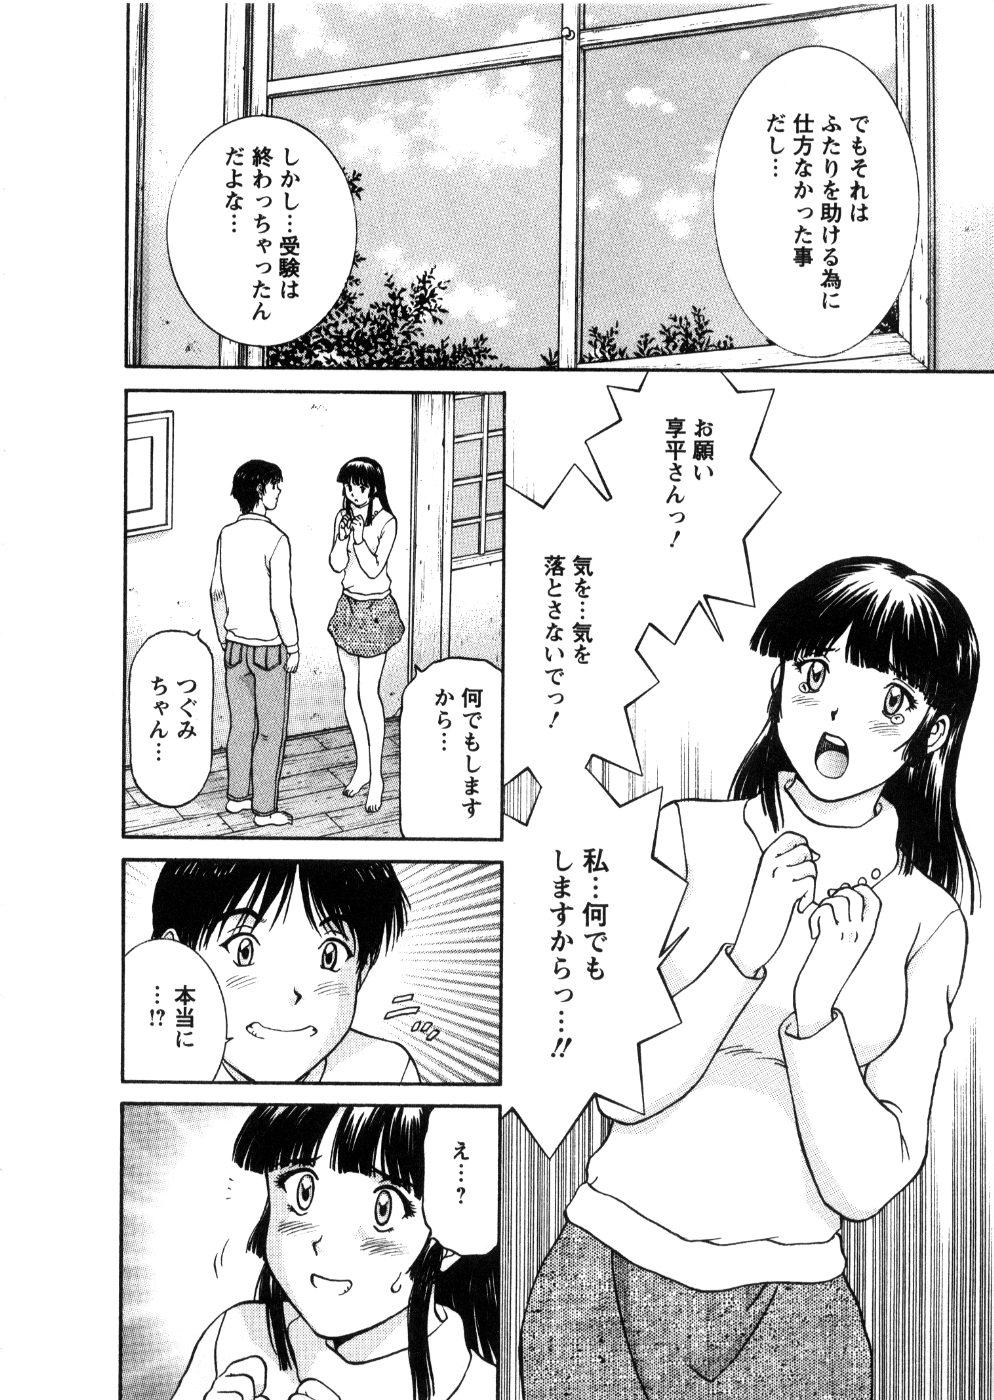 Oneechan-tachi ga Yatte Kuru 03 59